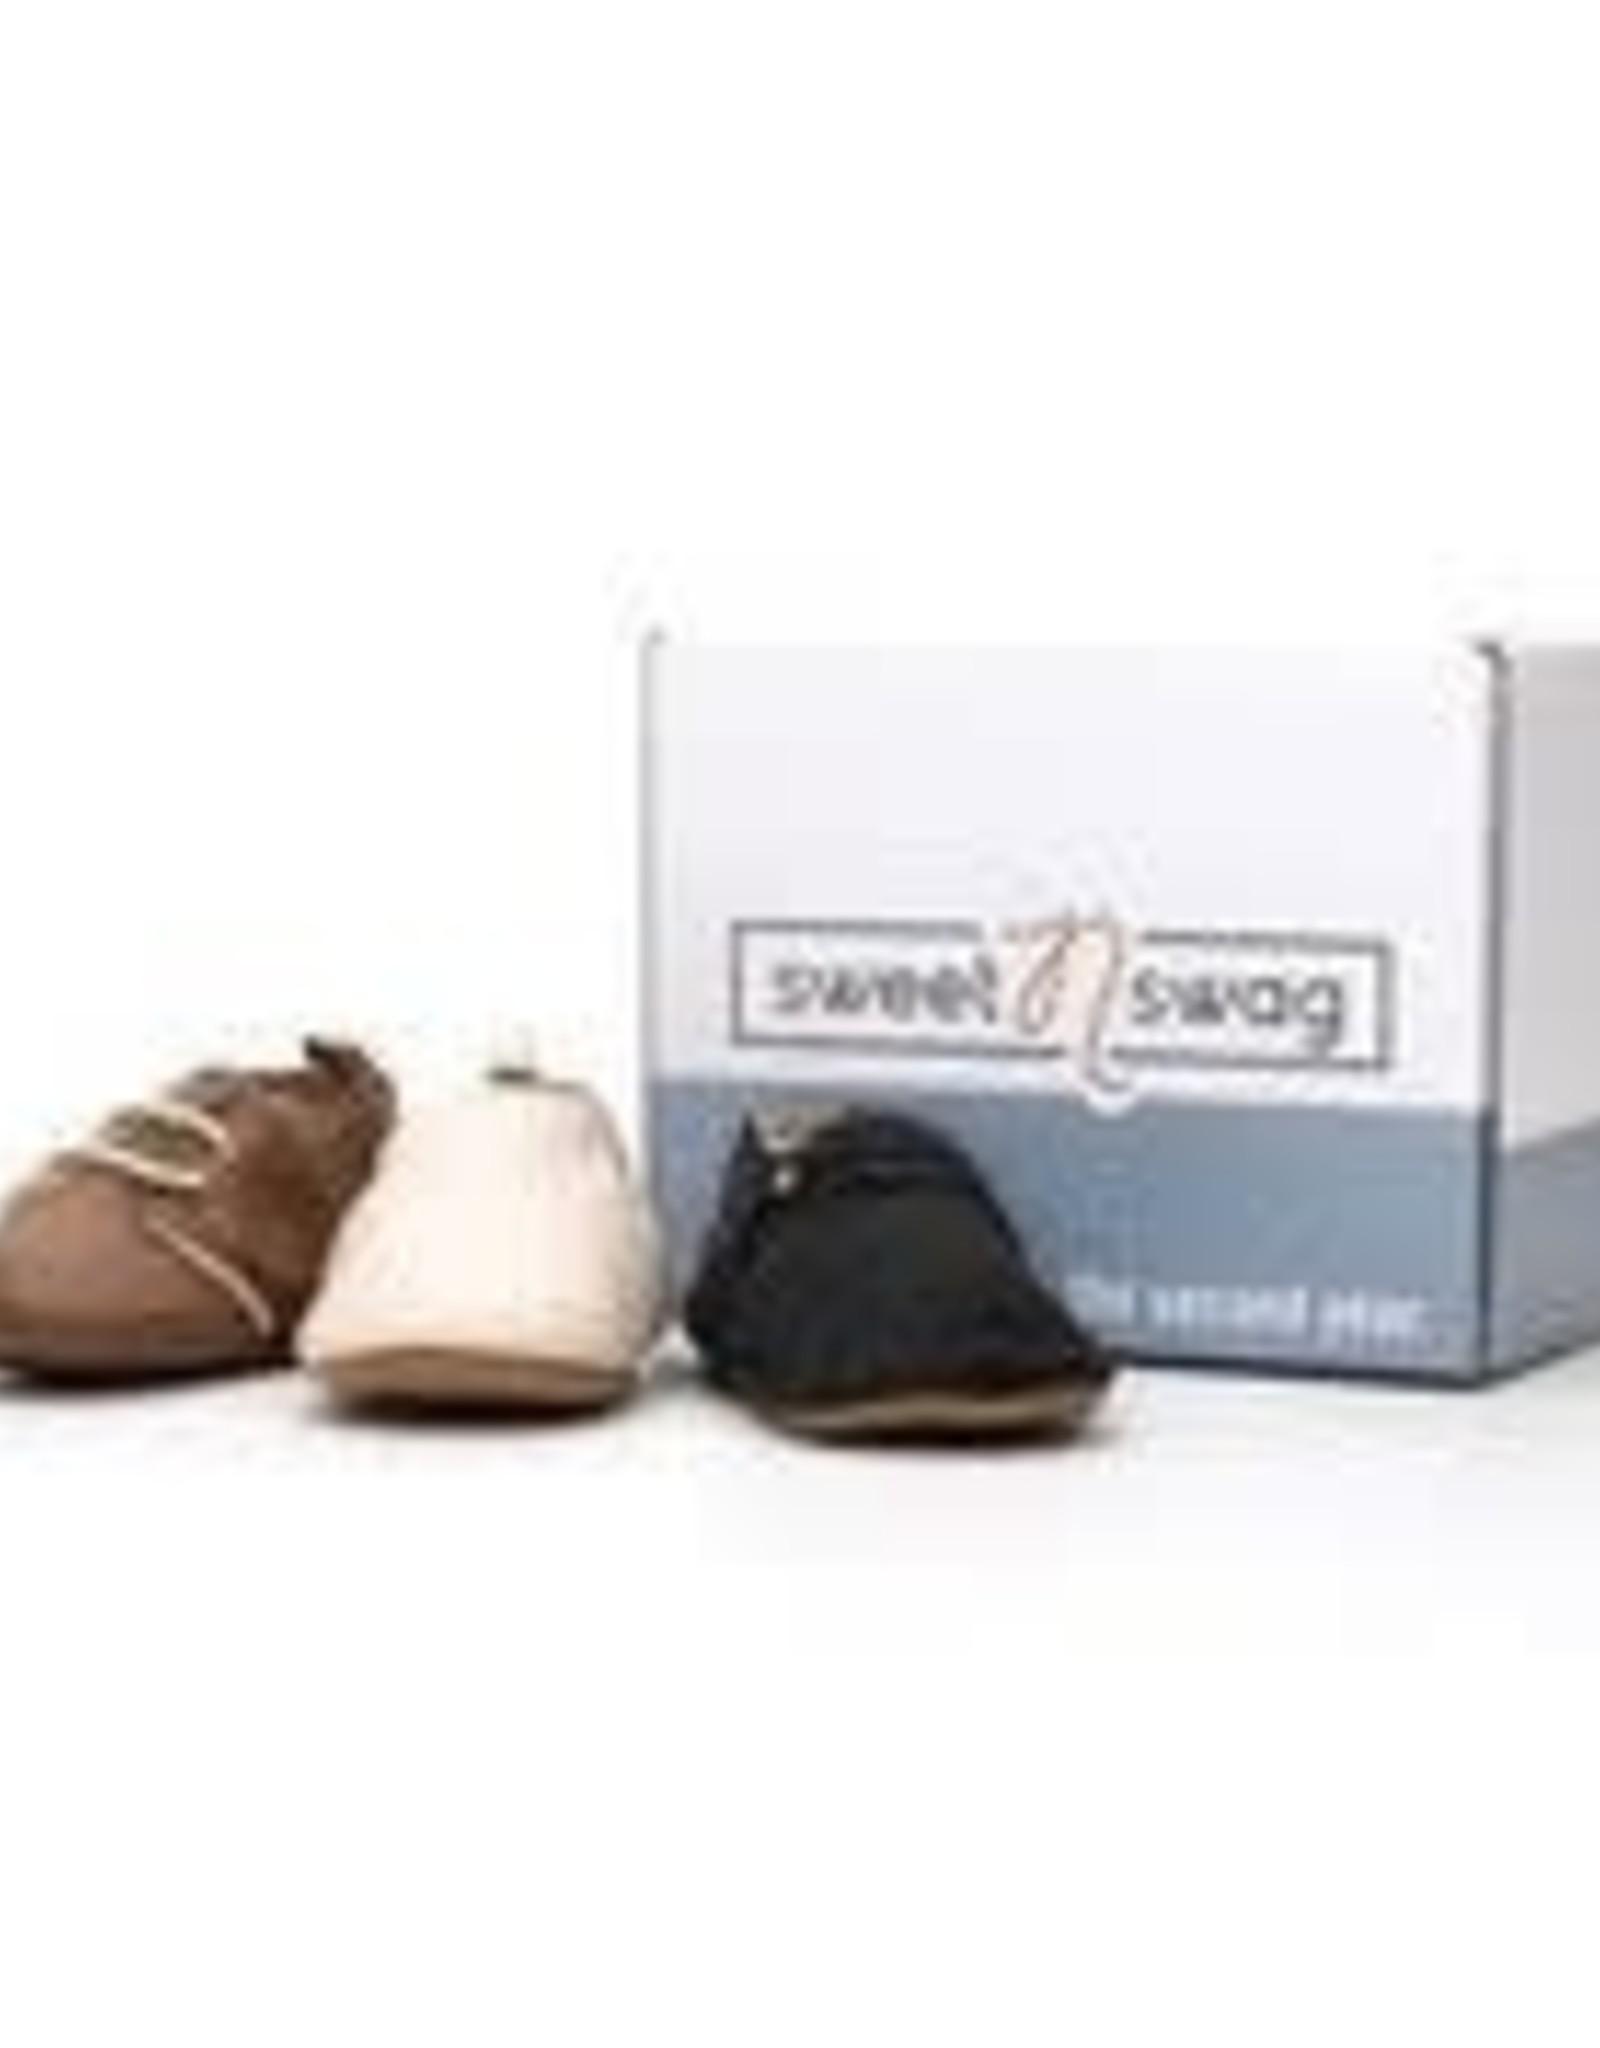 Sweet N Swag Sweet N Swag Second Year His Mox Box